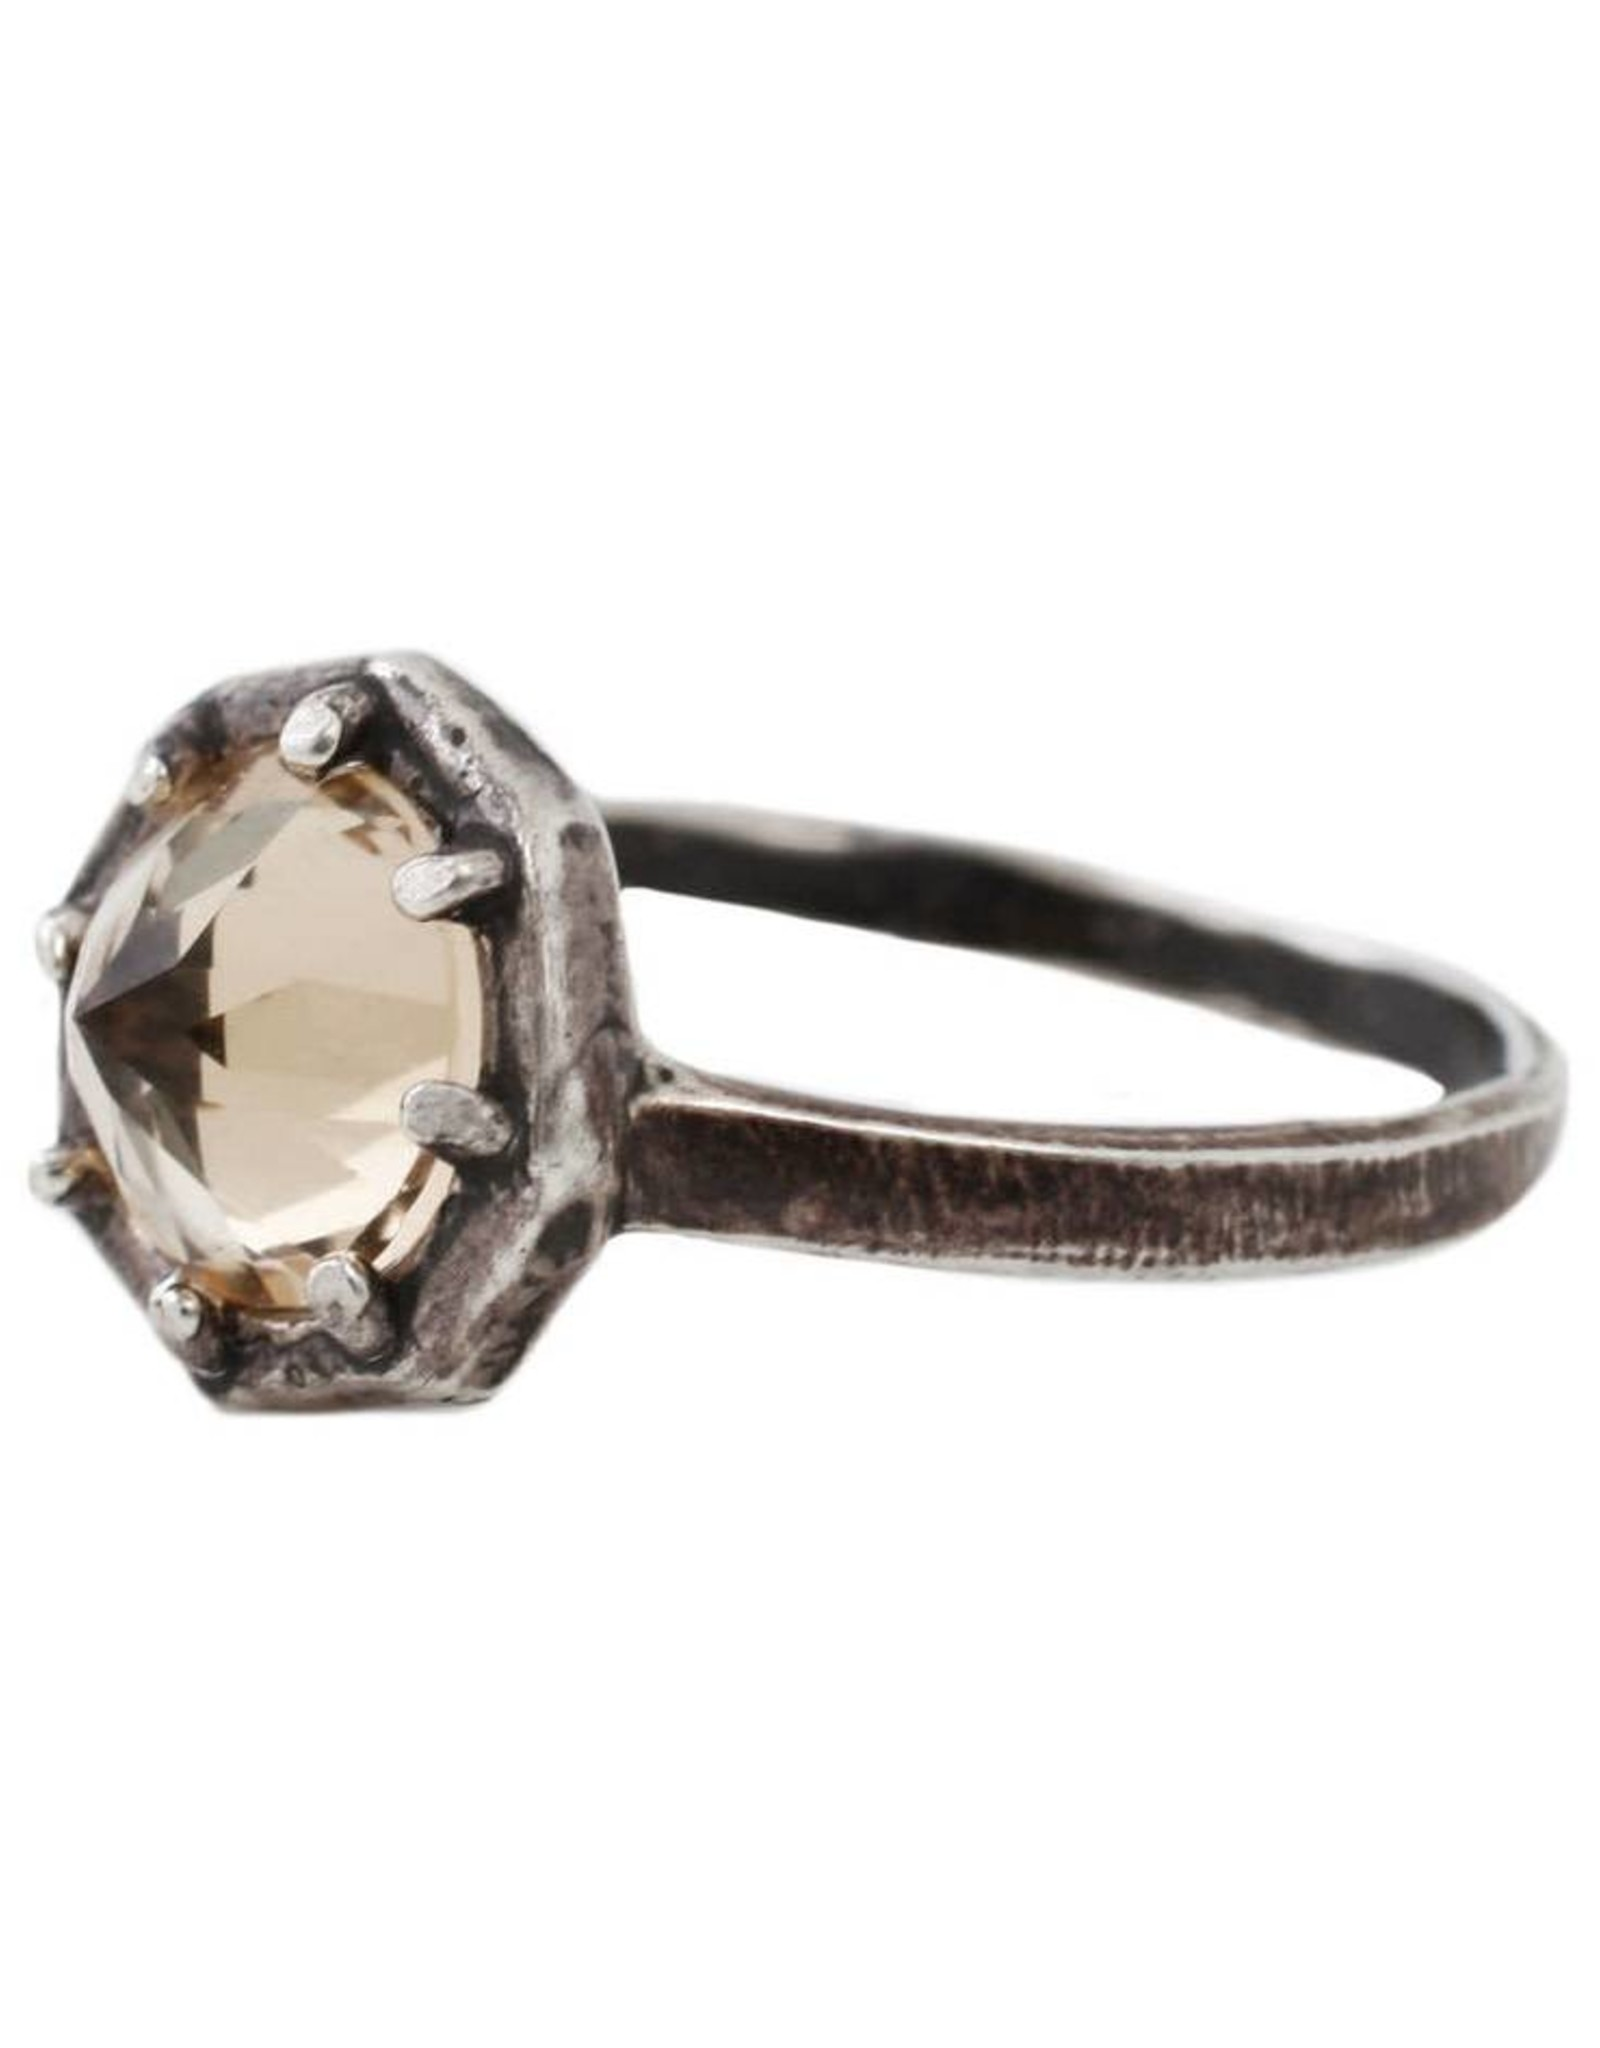 Lauren Wolf Jewelry Oxidized Silver Octagon Ring - Champagne Quartz